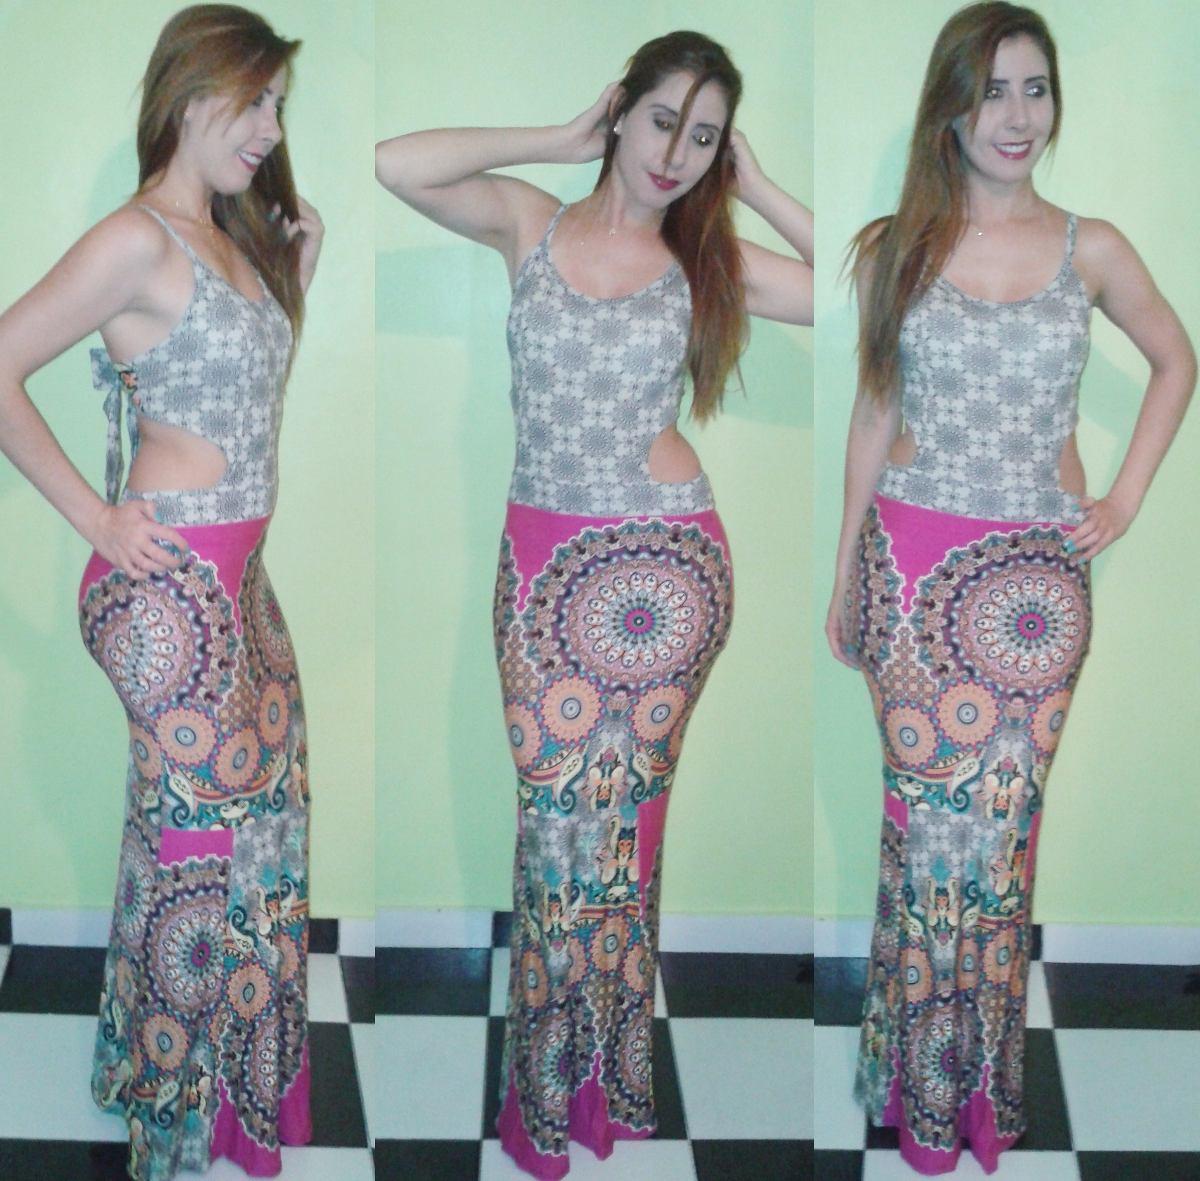 Vestido Longo Com Bojo Rabo De Sereia Levanta Bumbum Estampa